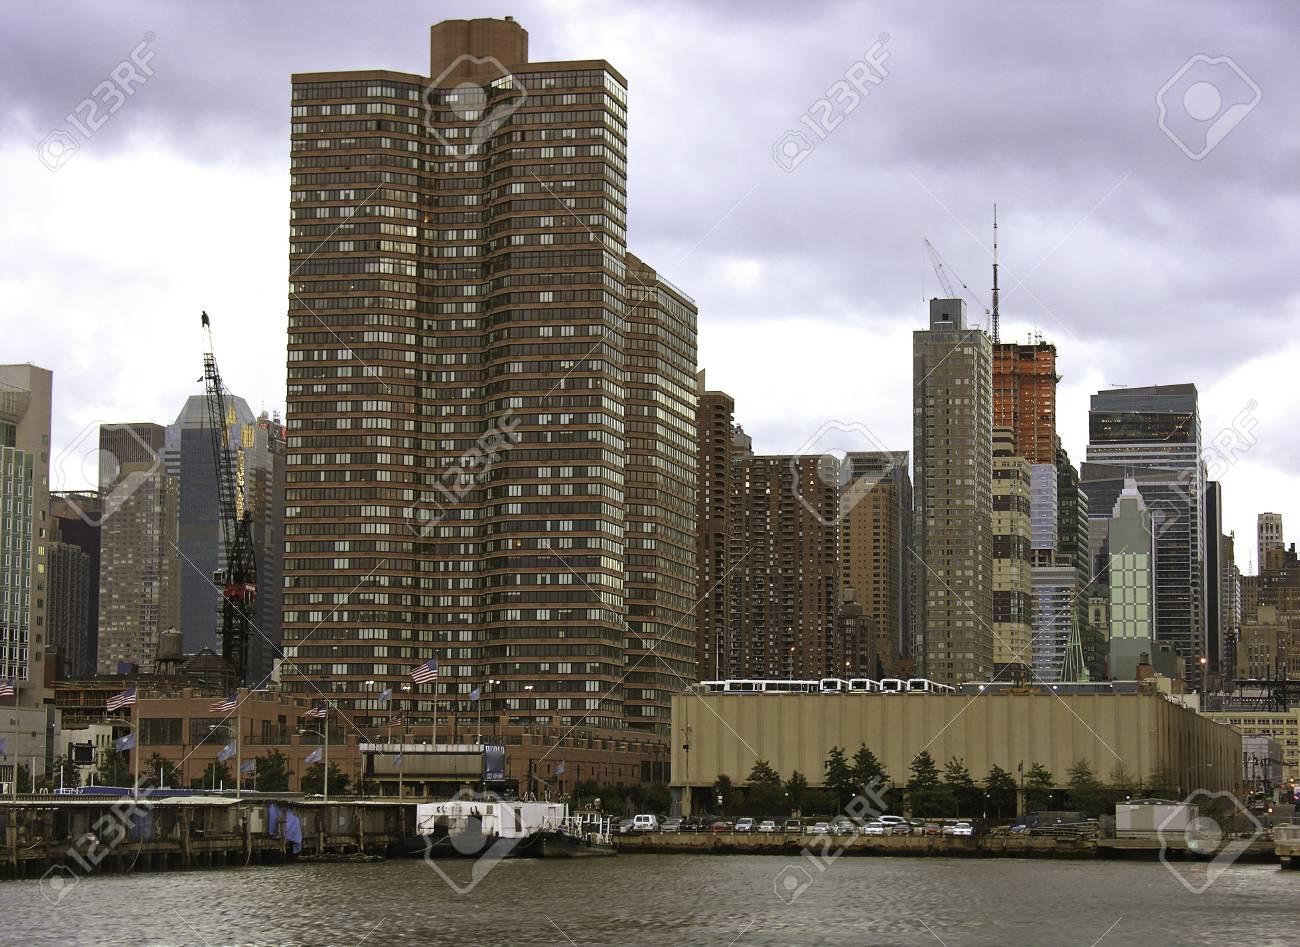 Buildings of New York City, USA Stock Photo - 12178235